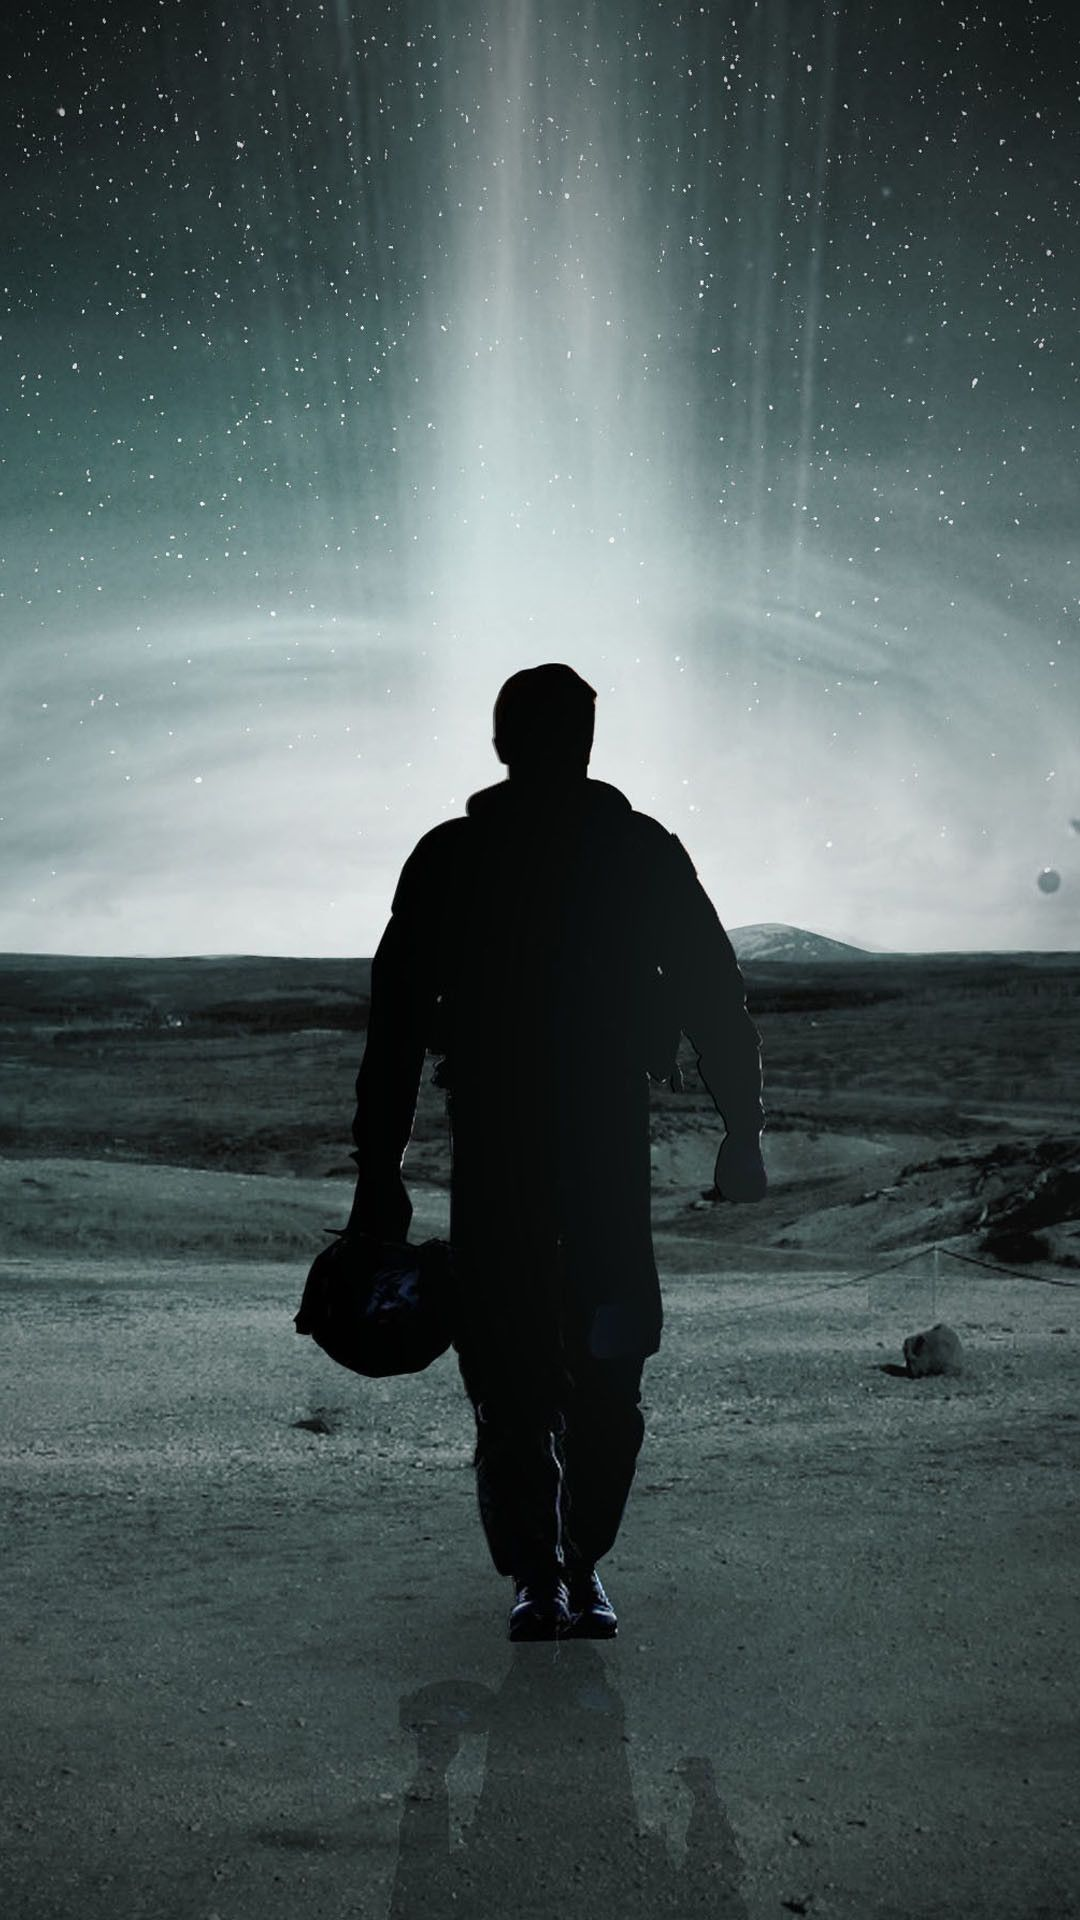 interstellar man space android wallpaper free download